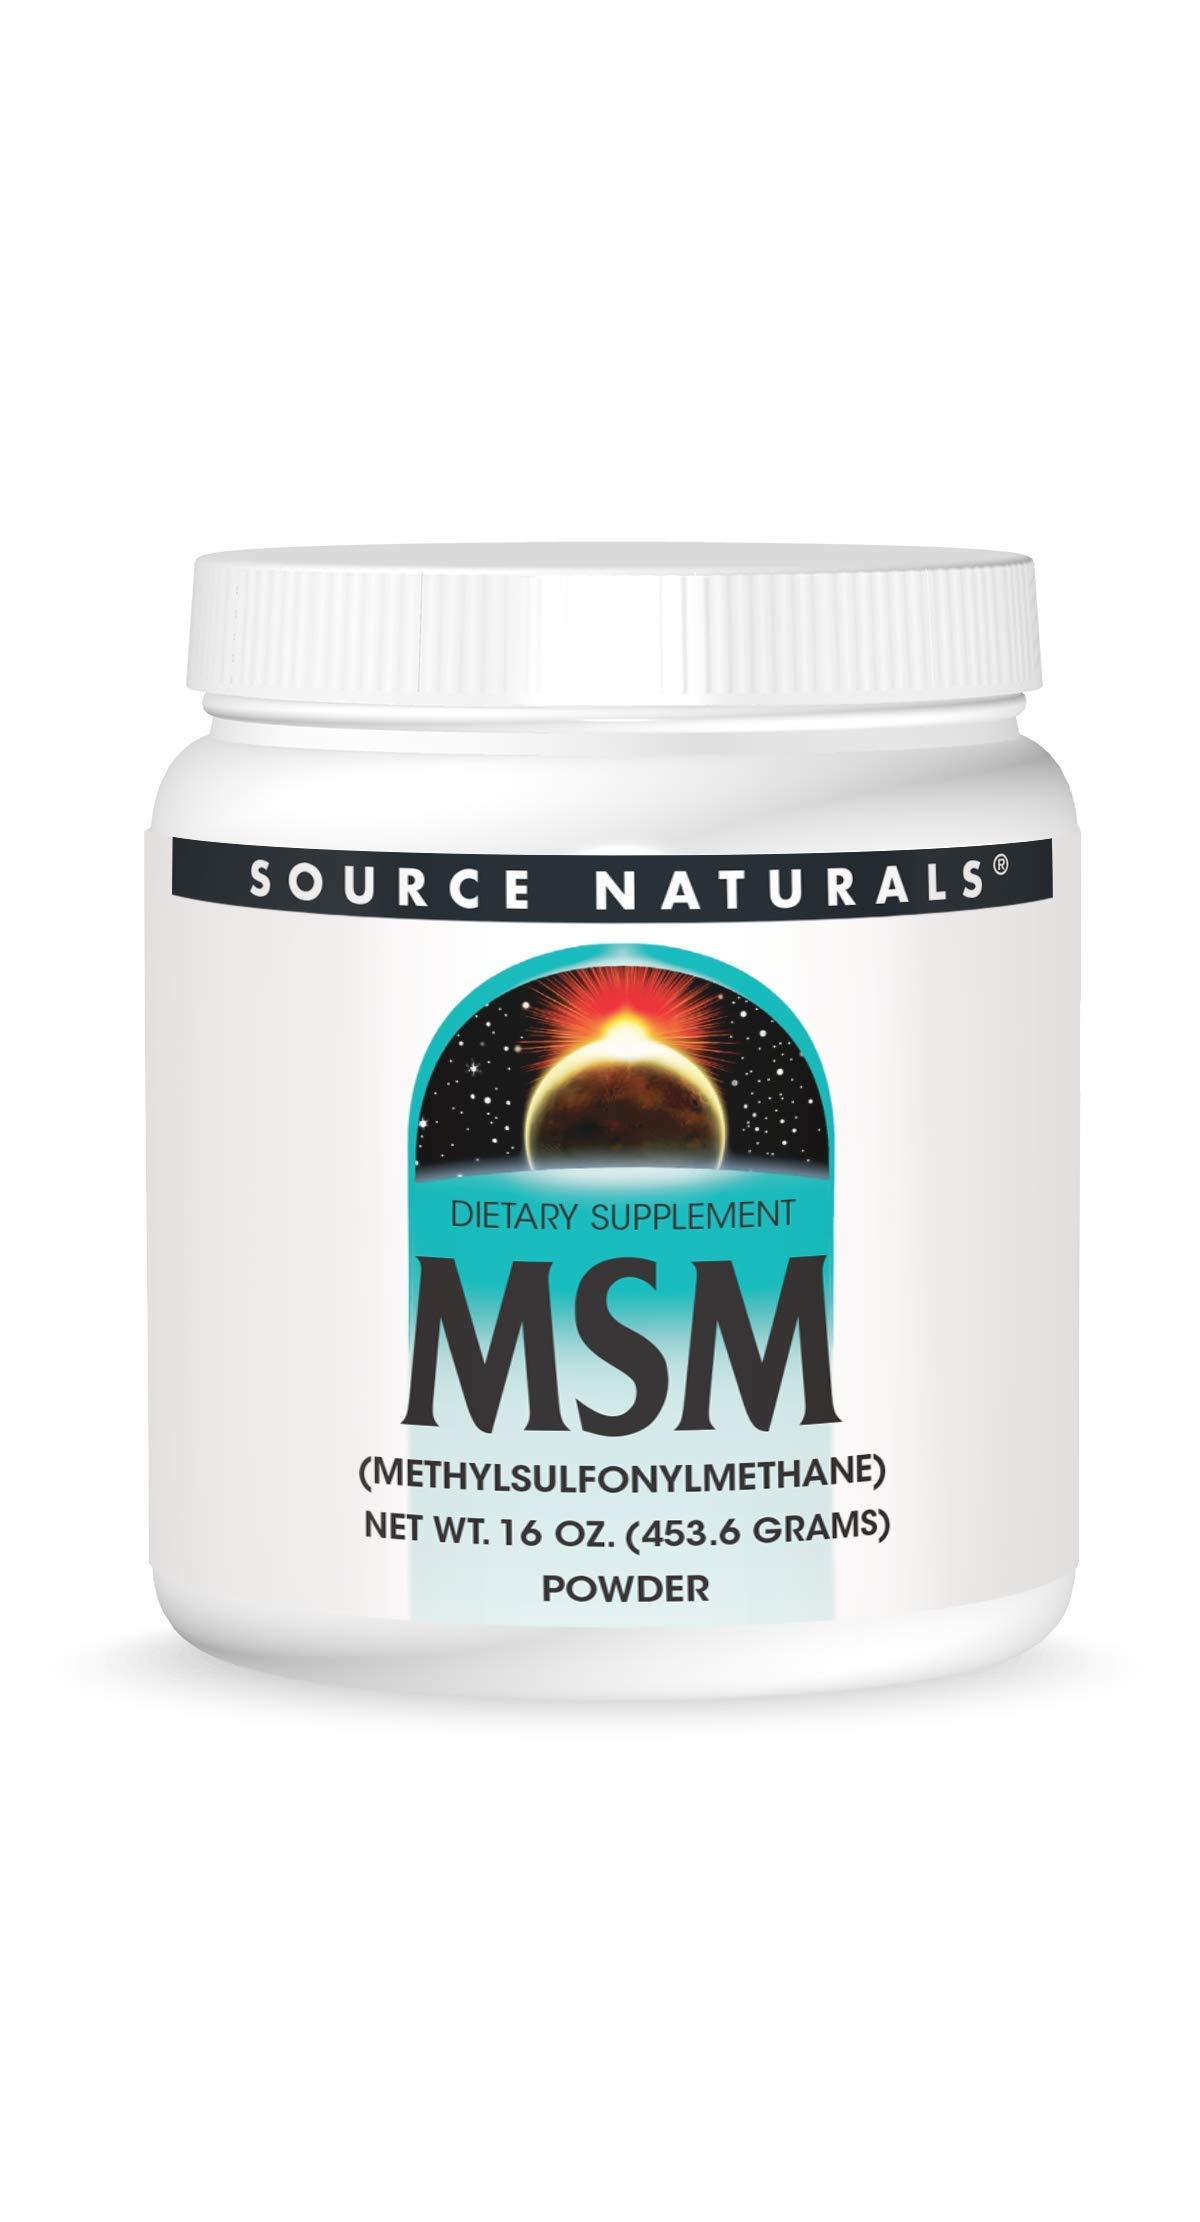 Source Naturals MSM (Methylsulfonylmethane) Powder 16 Ounces(453.6 Grams)